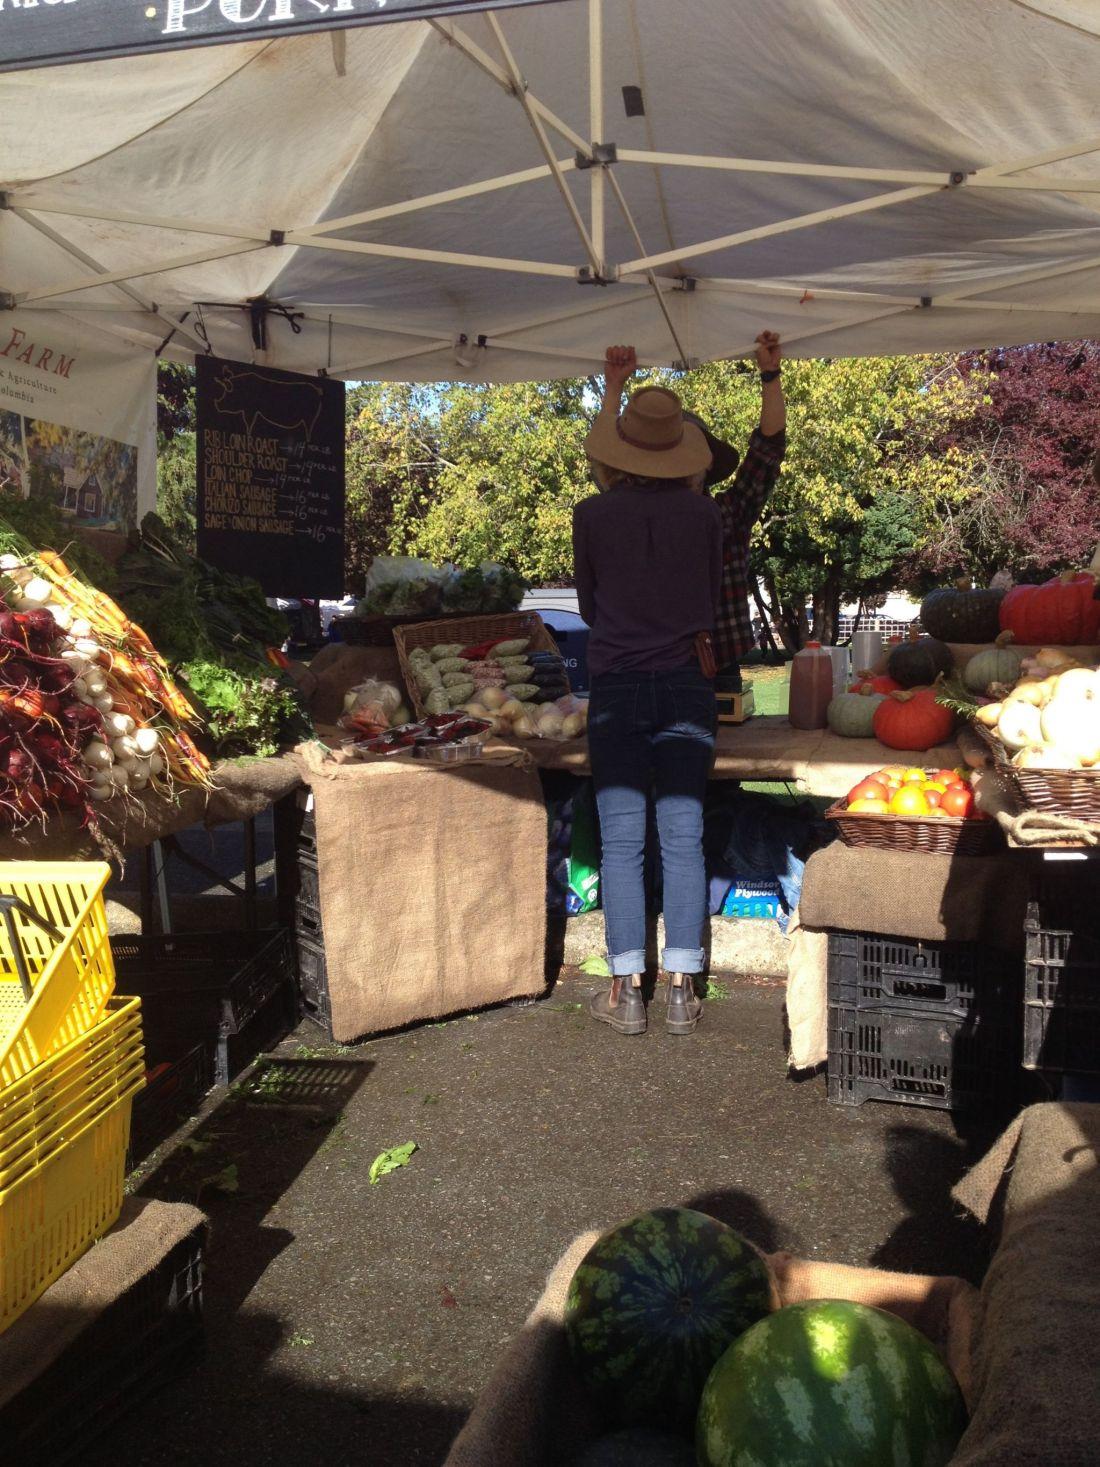 Market stalls on Saturday